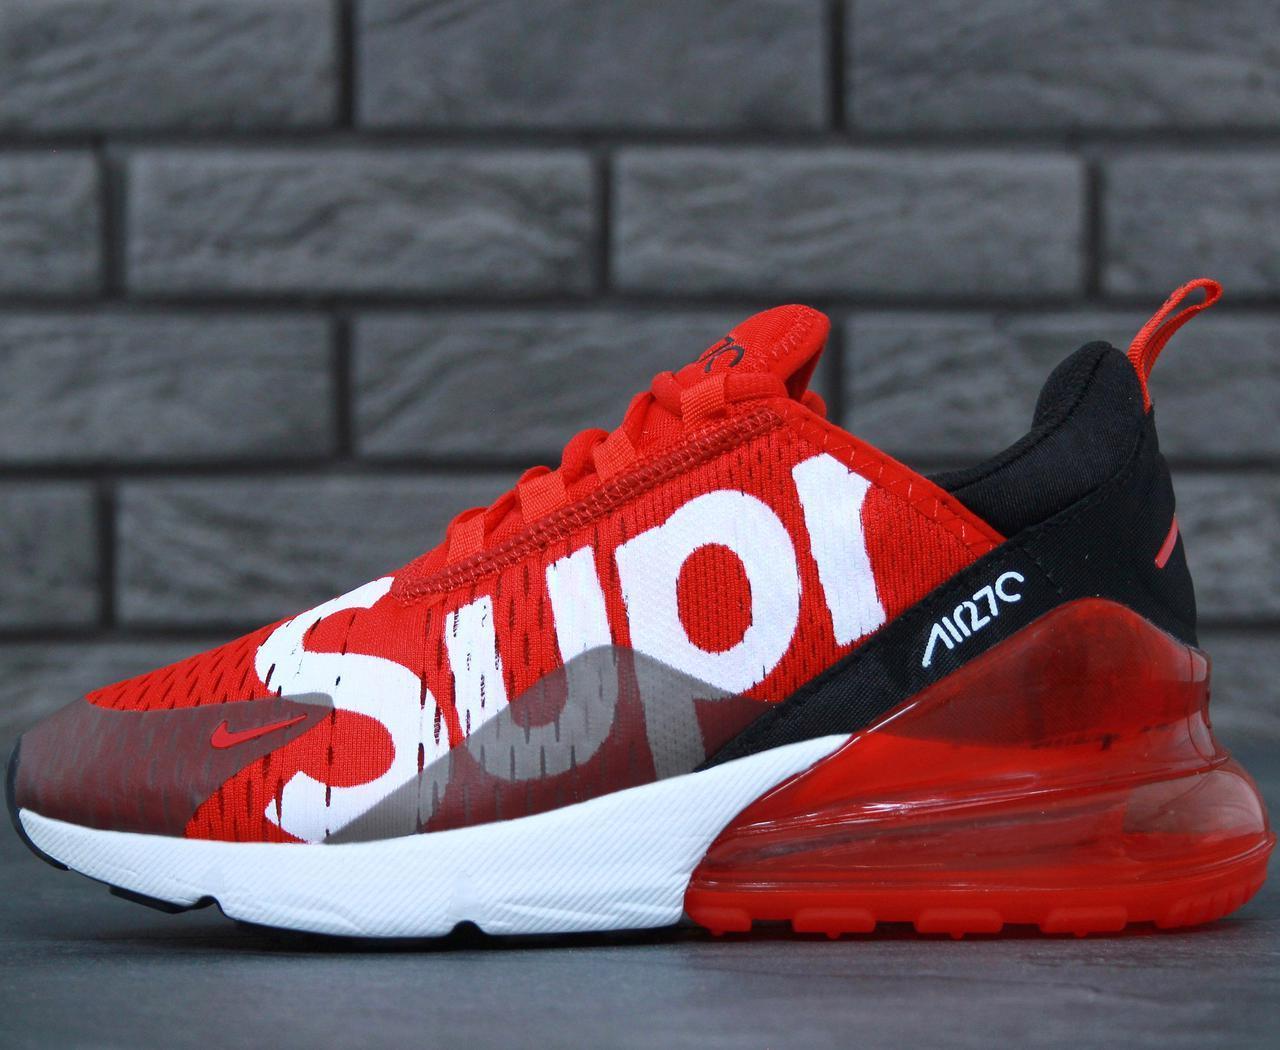 879dc0c9 Мужские кроссовки Nike Air Max 270 Red Supreme, Найк Аир Макс 270 Красные